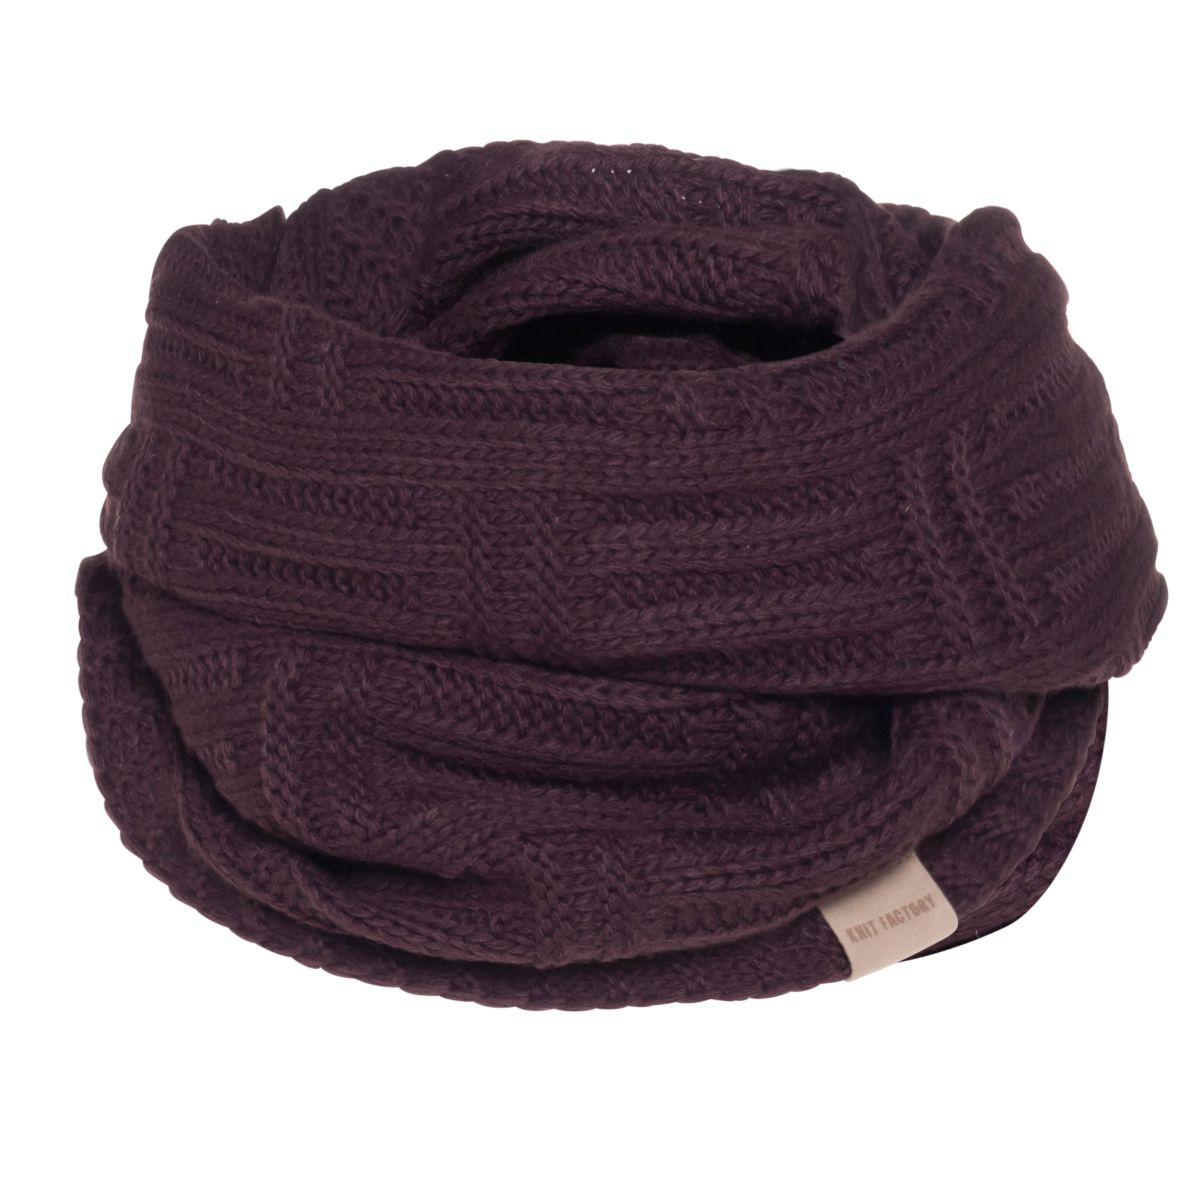 bobby infinity scarf aubergine